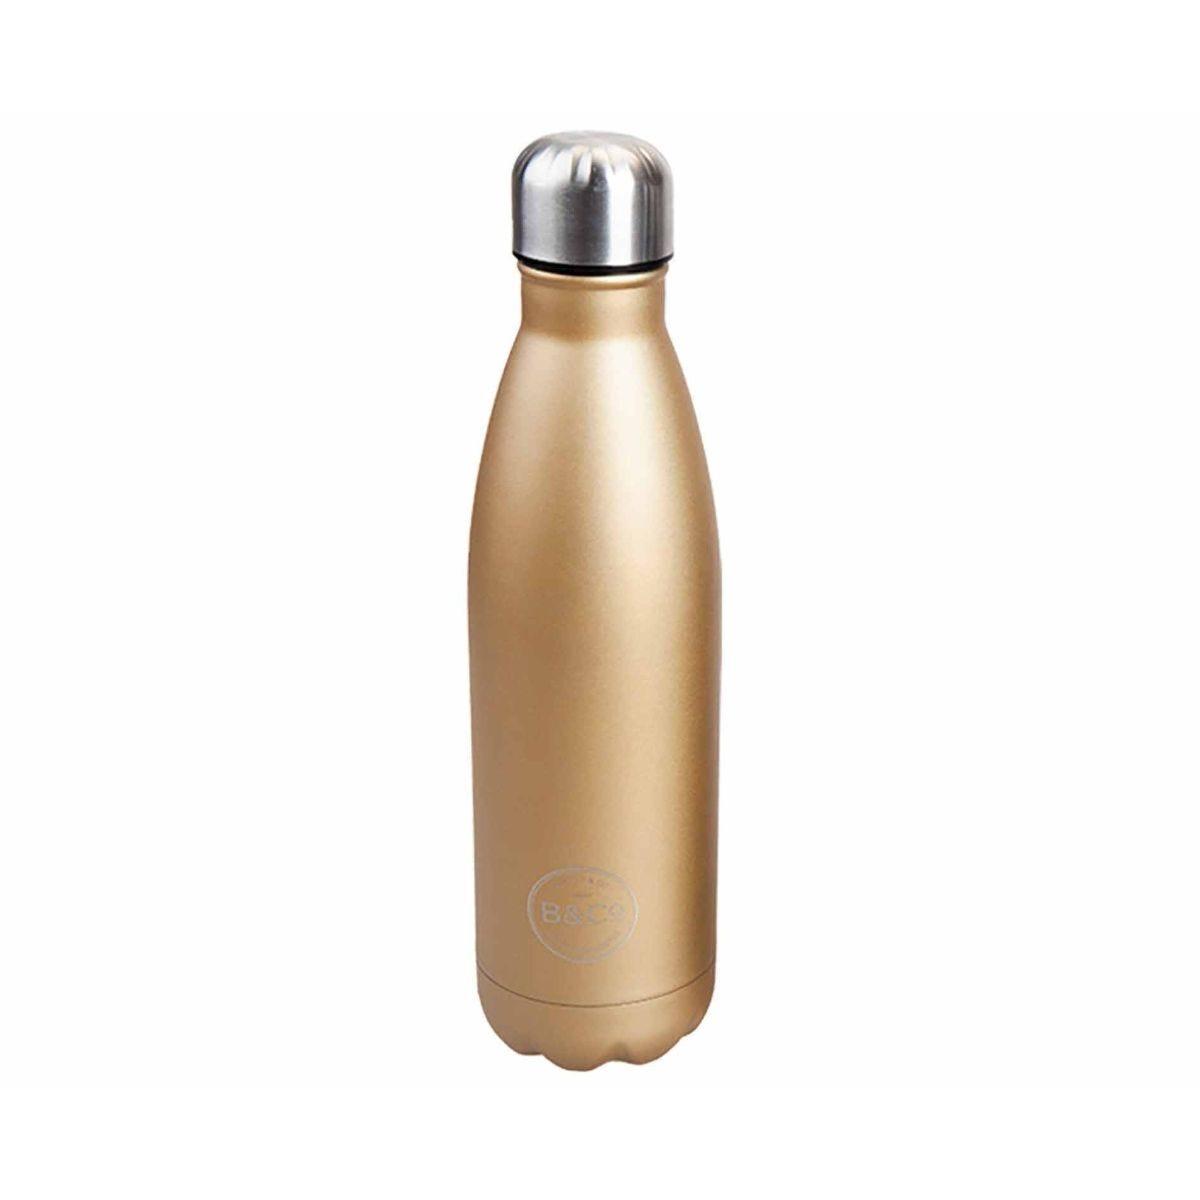 B and Co Hamelin Bottle Flask 500ml Gold